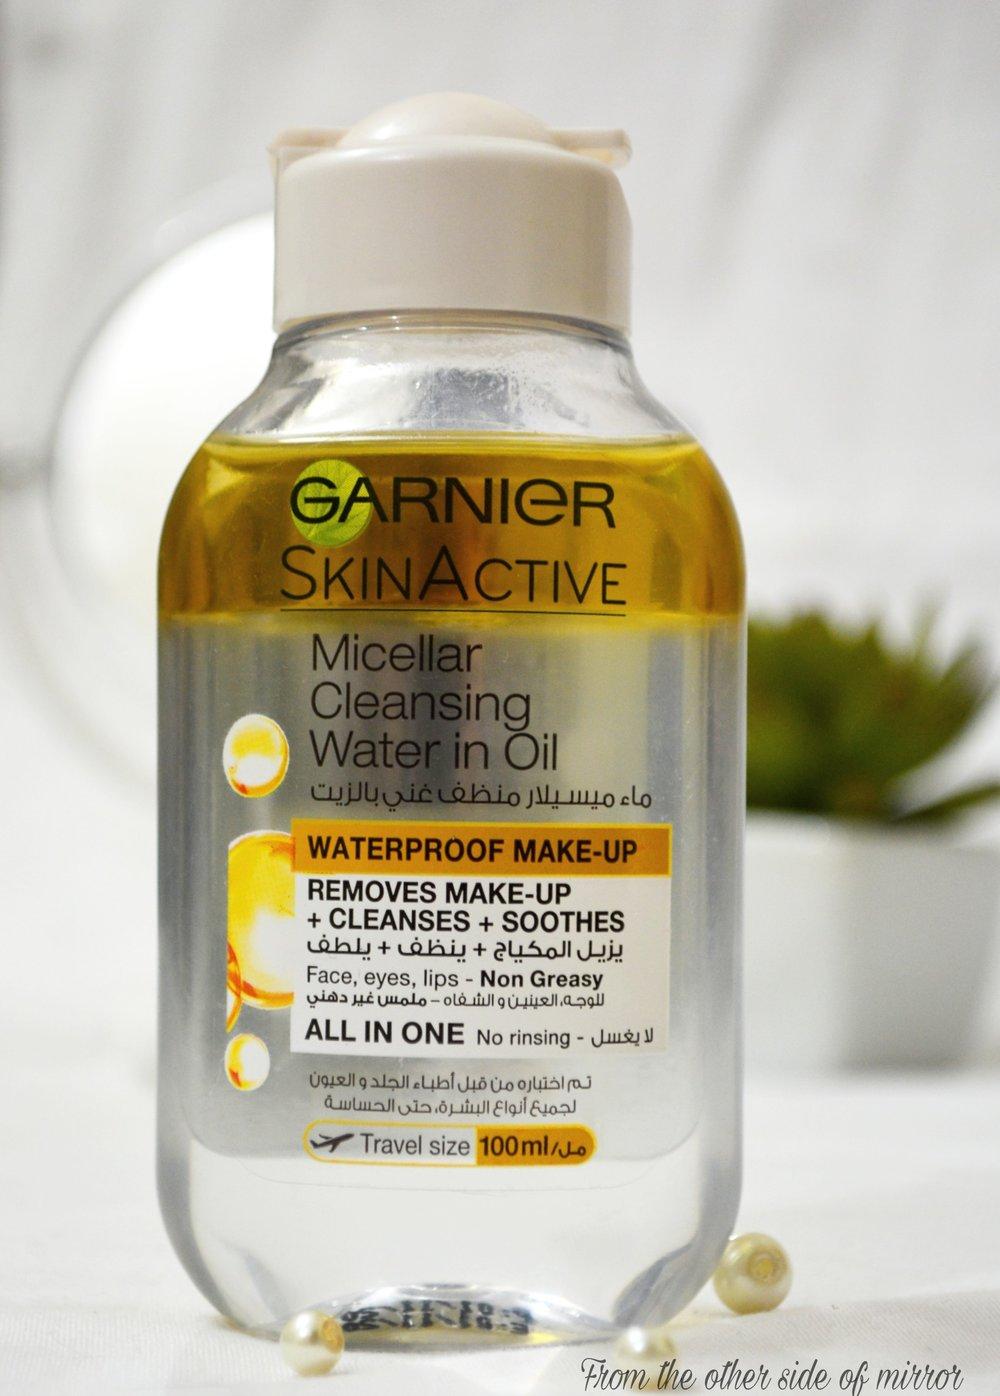 The Garnier Micellar Oil Infused Cleansing Water